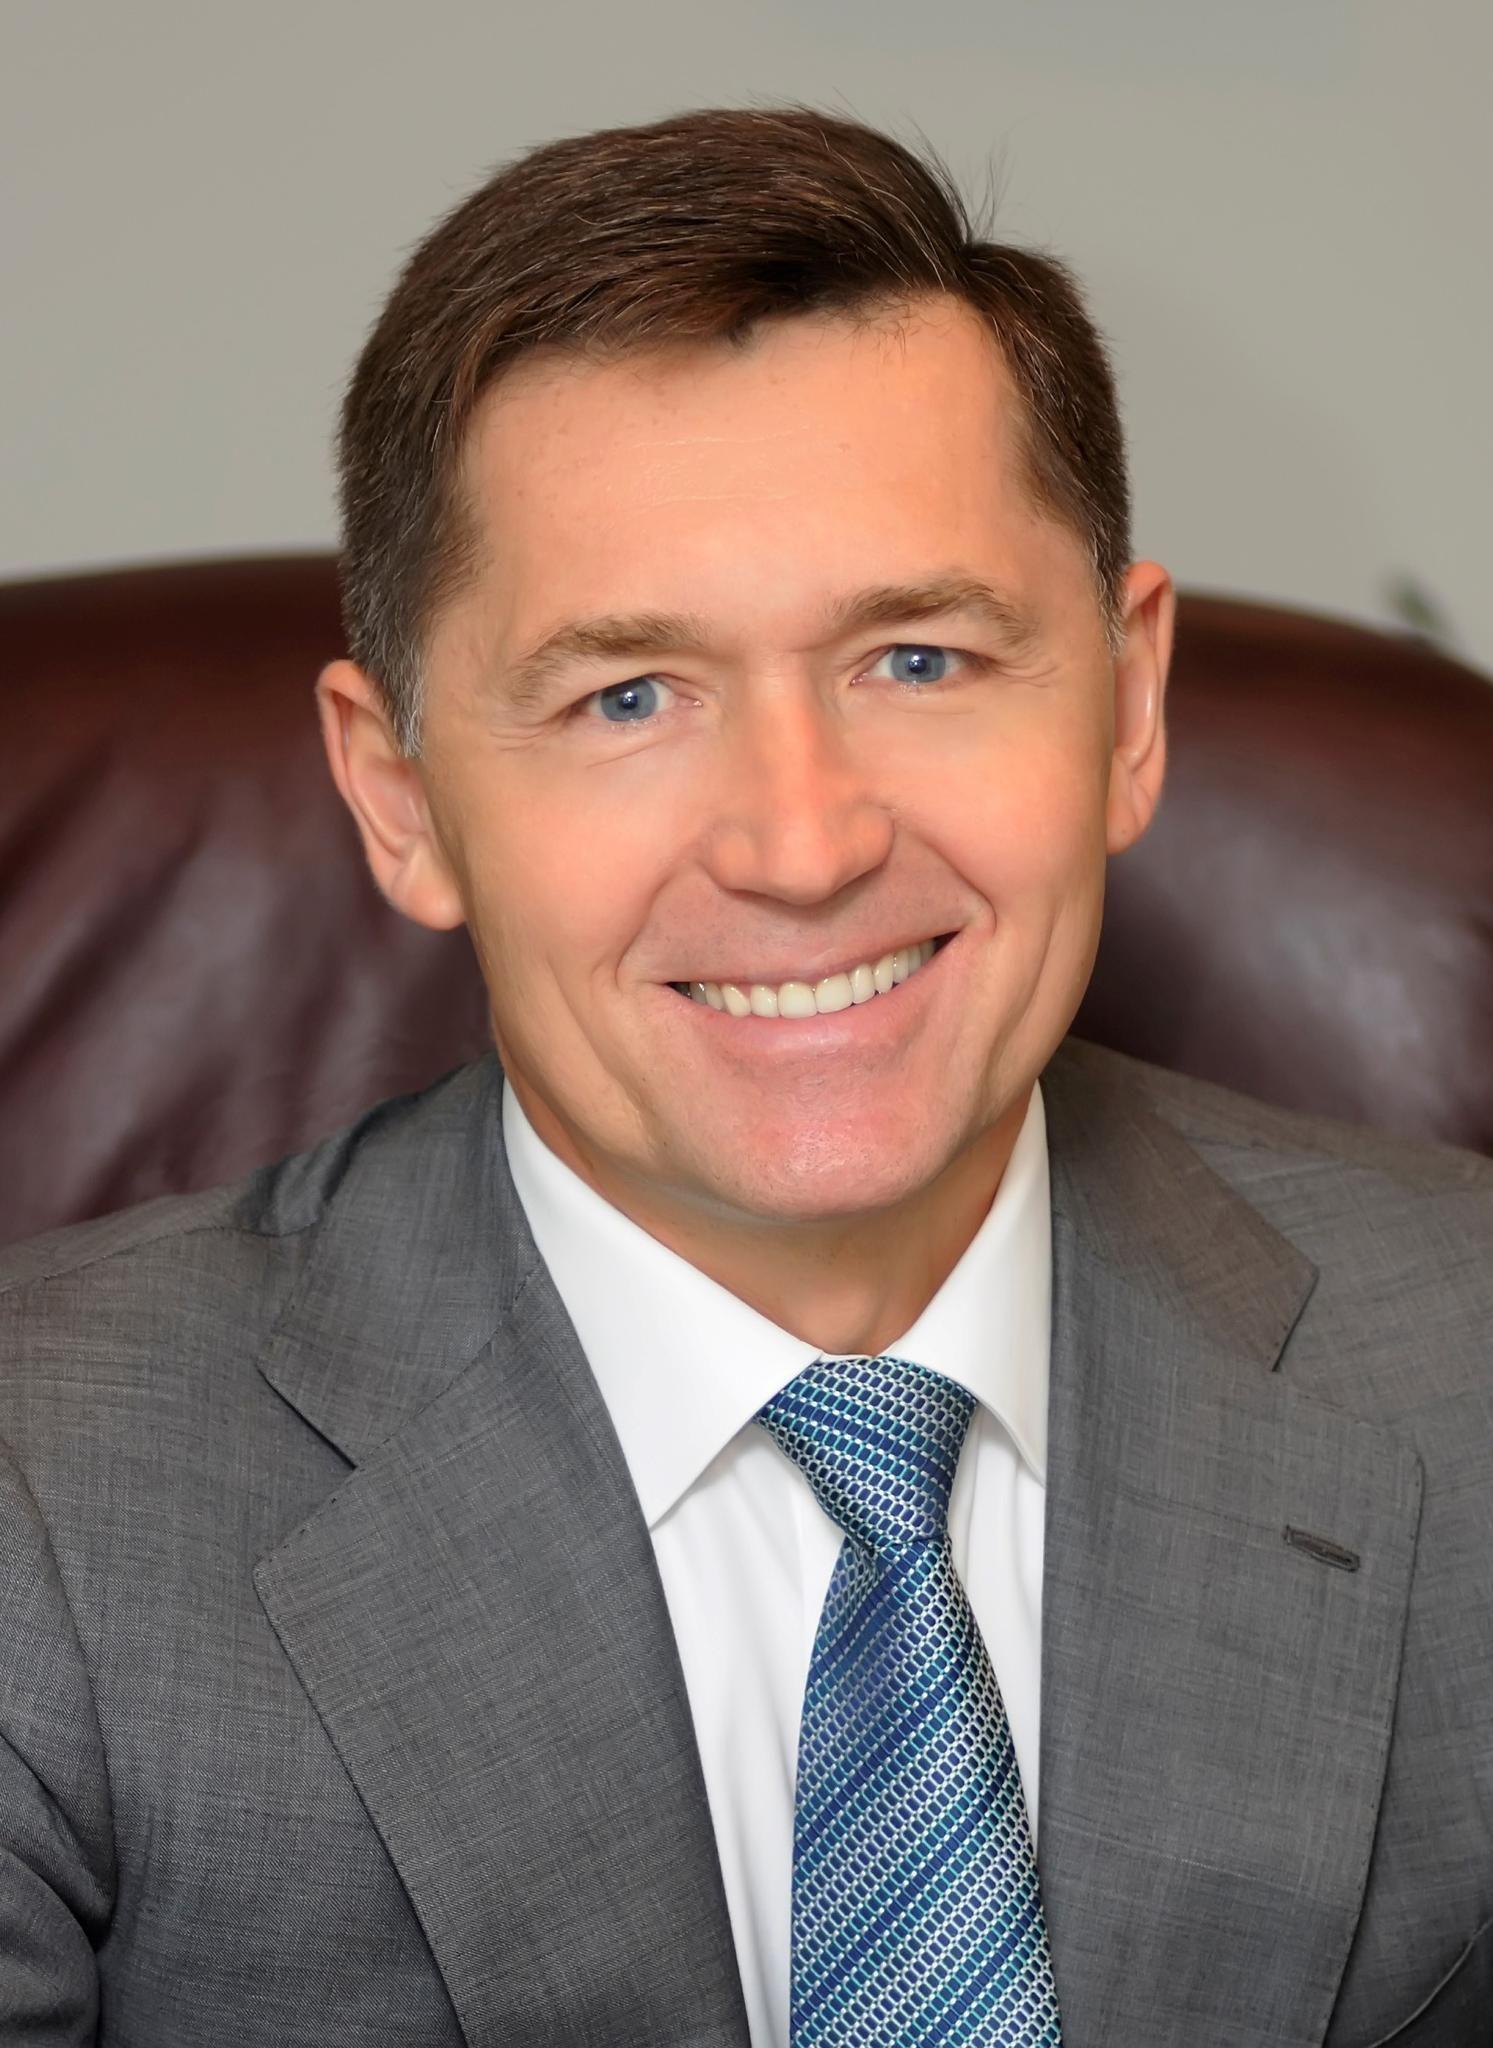 Andrey Shutov